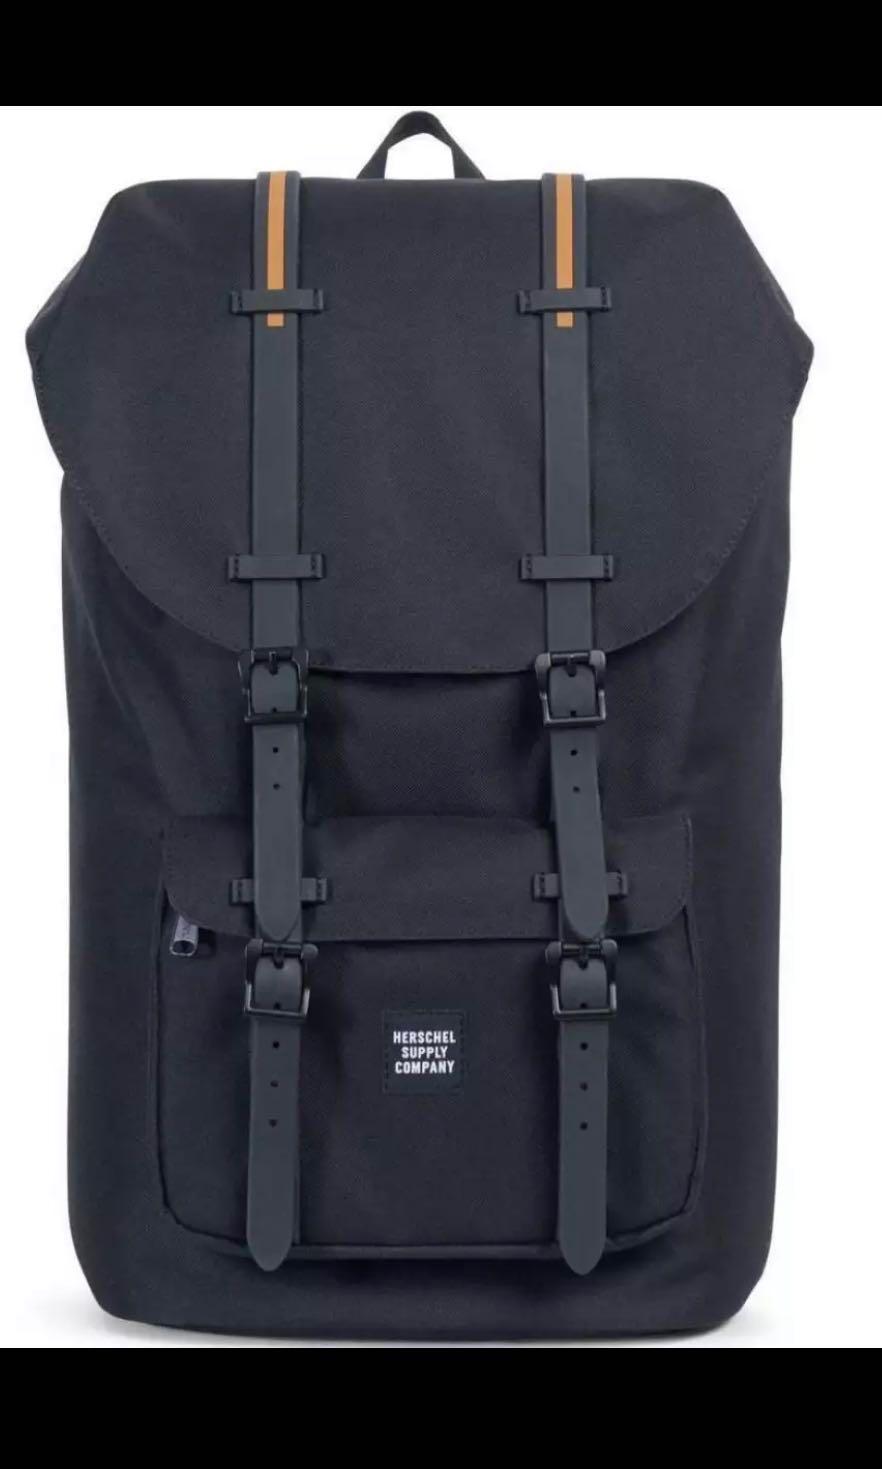 62c5e4bb61 Herschel Supply Co. Little America Backpack Classic Size Full Volume ...